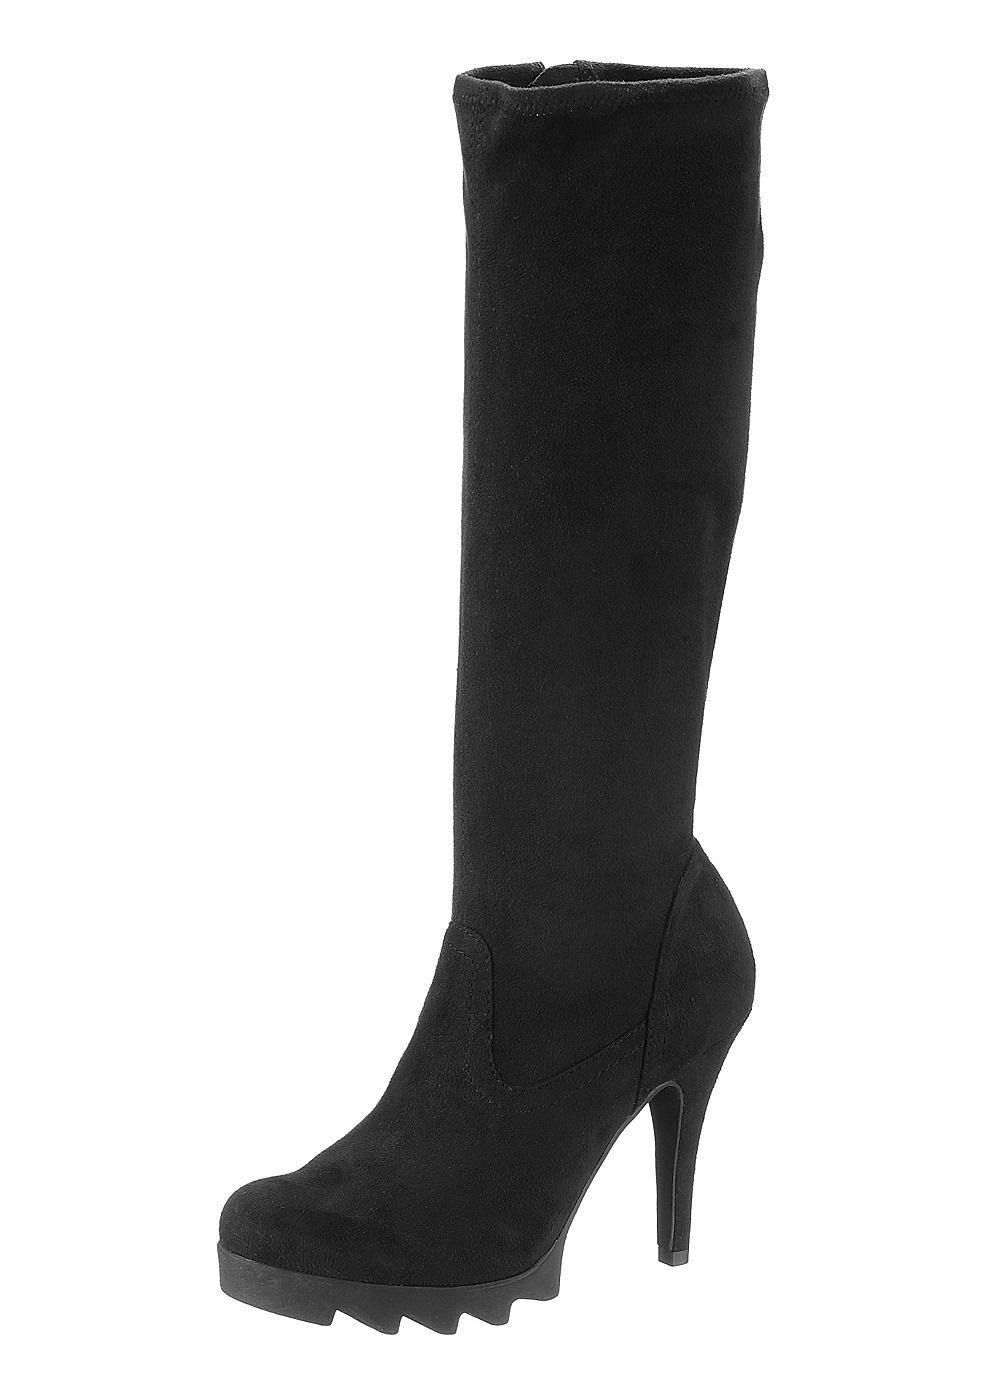 High Heel Stiefel, Tamaris, Textil in Velourslederoptik